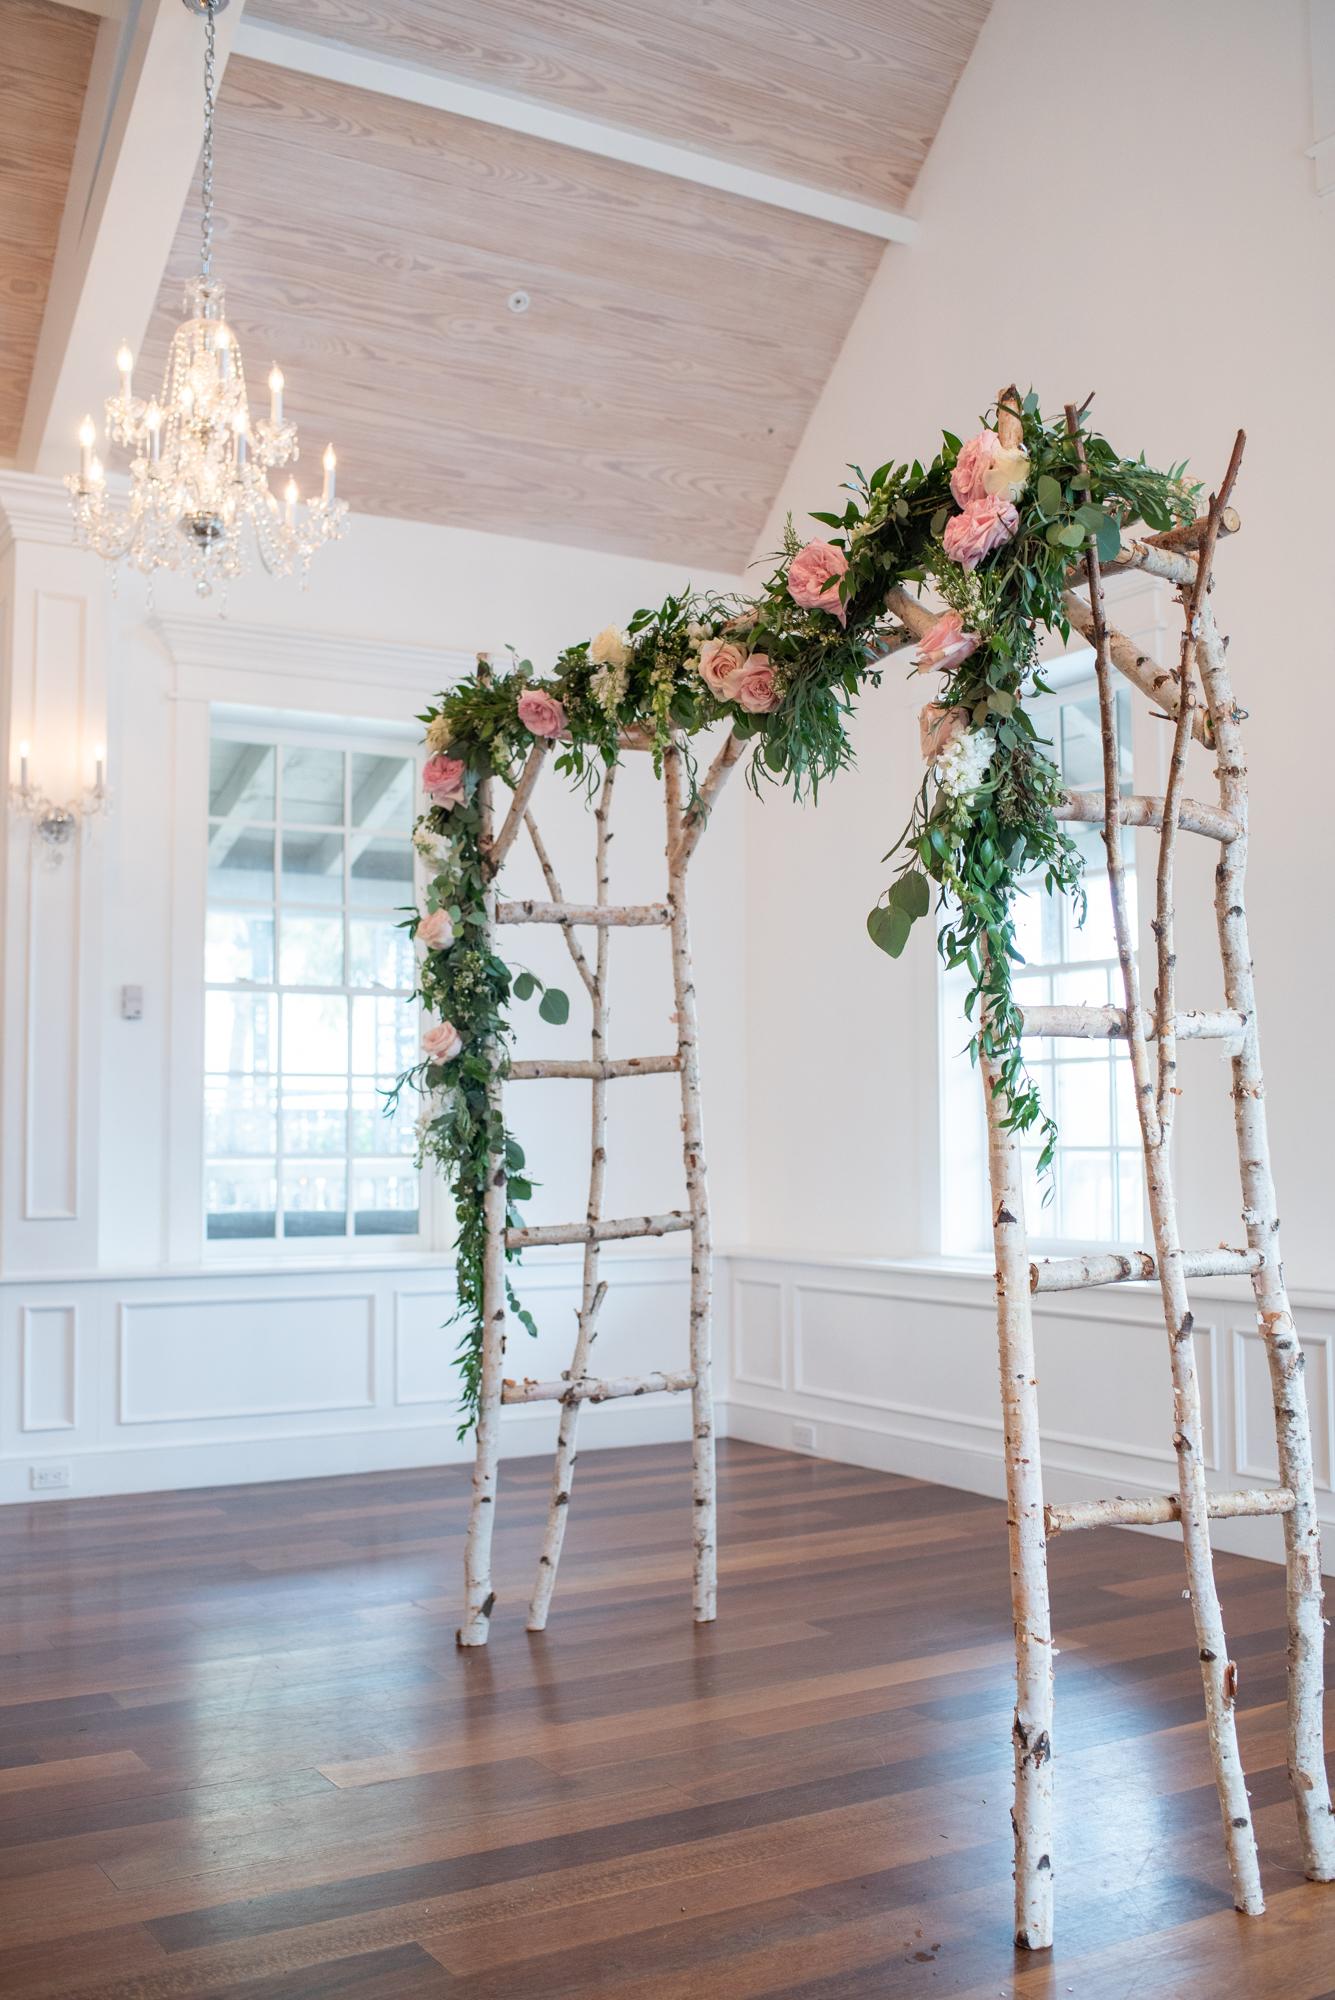 st-augustine-photographer-st-augustine-gay-wedding-sam-sex-wedding-photographer-sarah-annay-photography-white-room-weddings-25.jpg